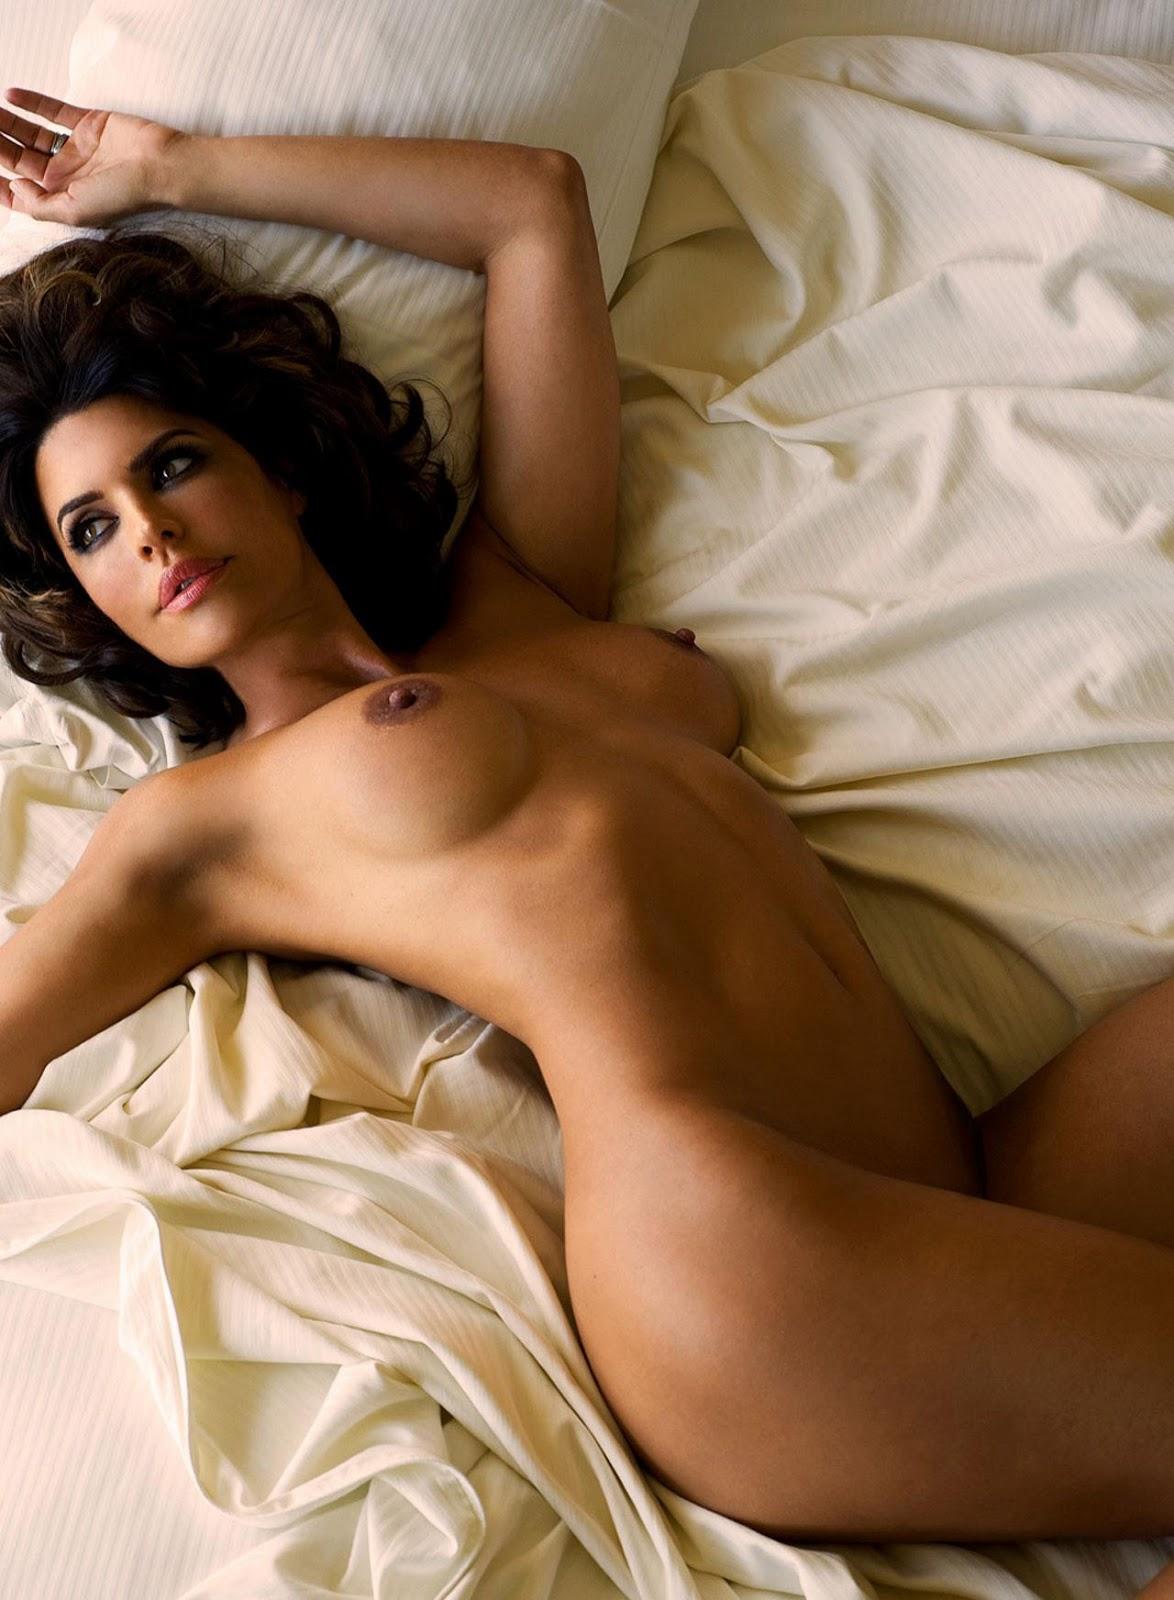 ffm-video-lisa-rinna-nude-videos-xxx-woman